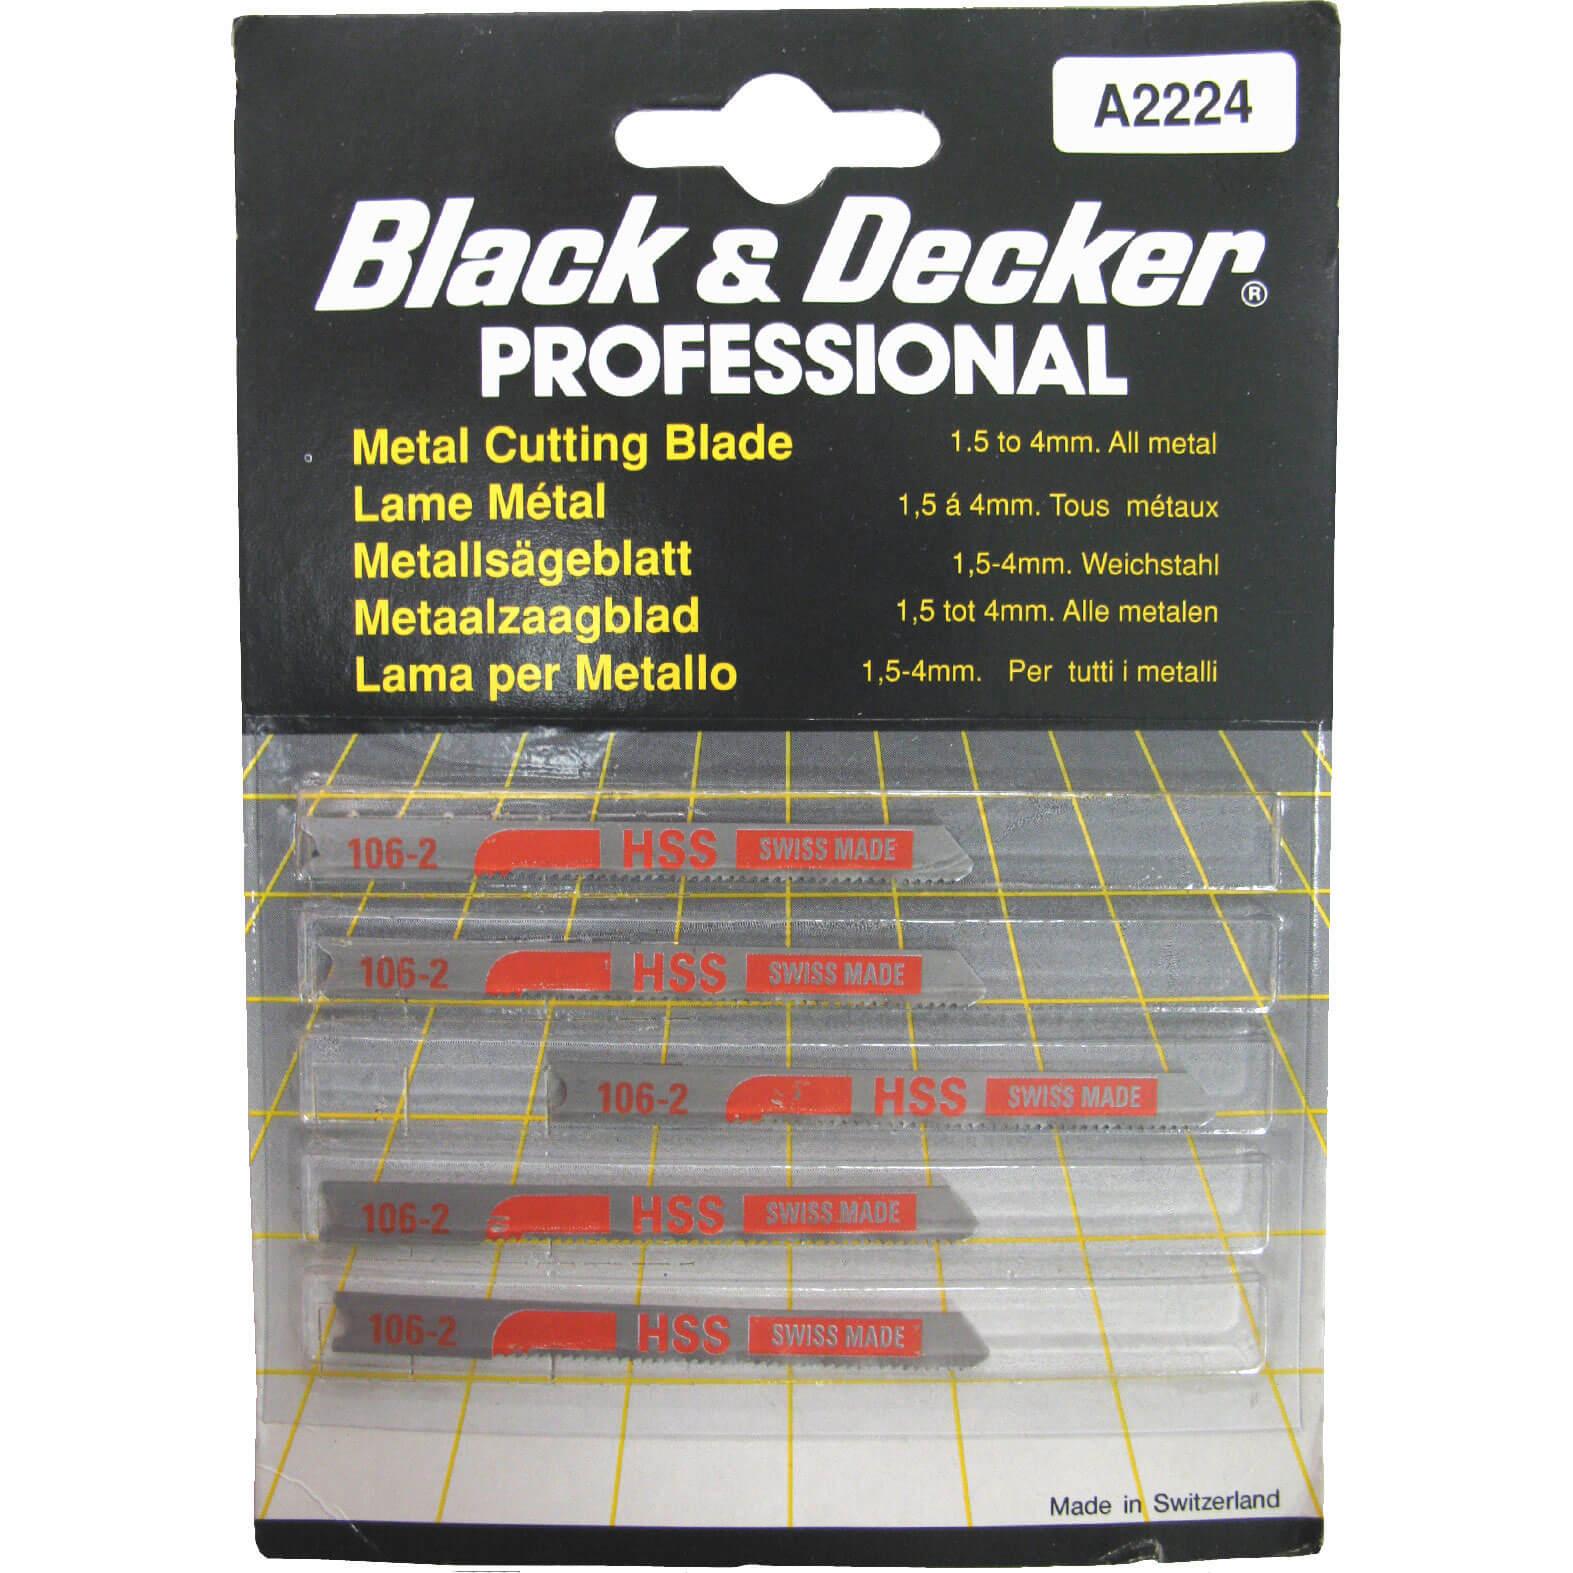 Image of Black & Decker A2224 Universal Metal Cutting Jigsaw Blades Pack of 5